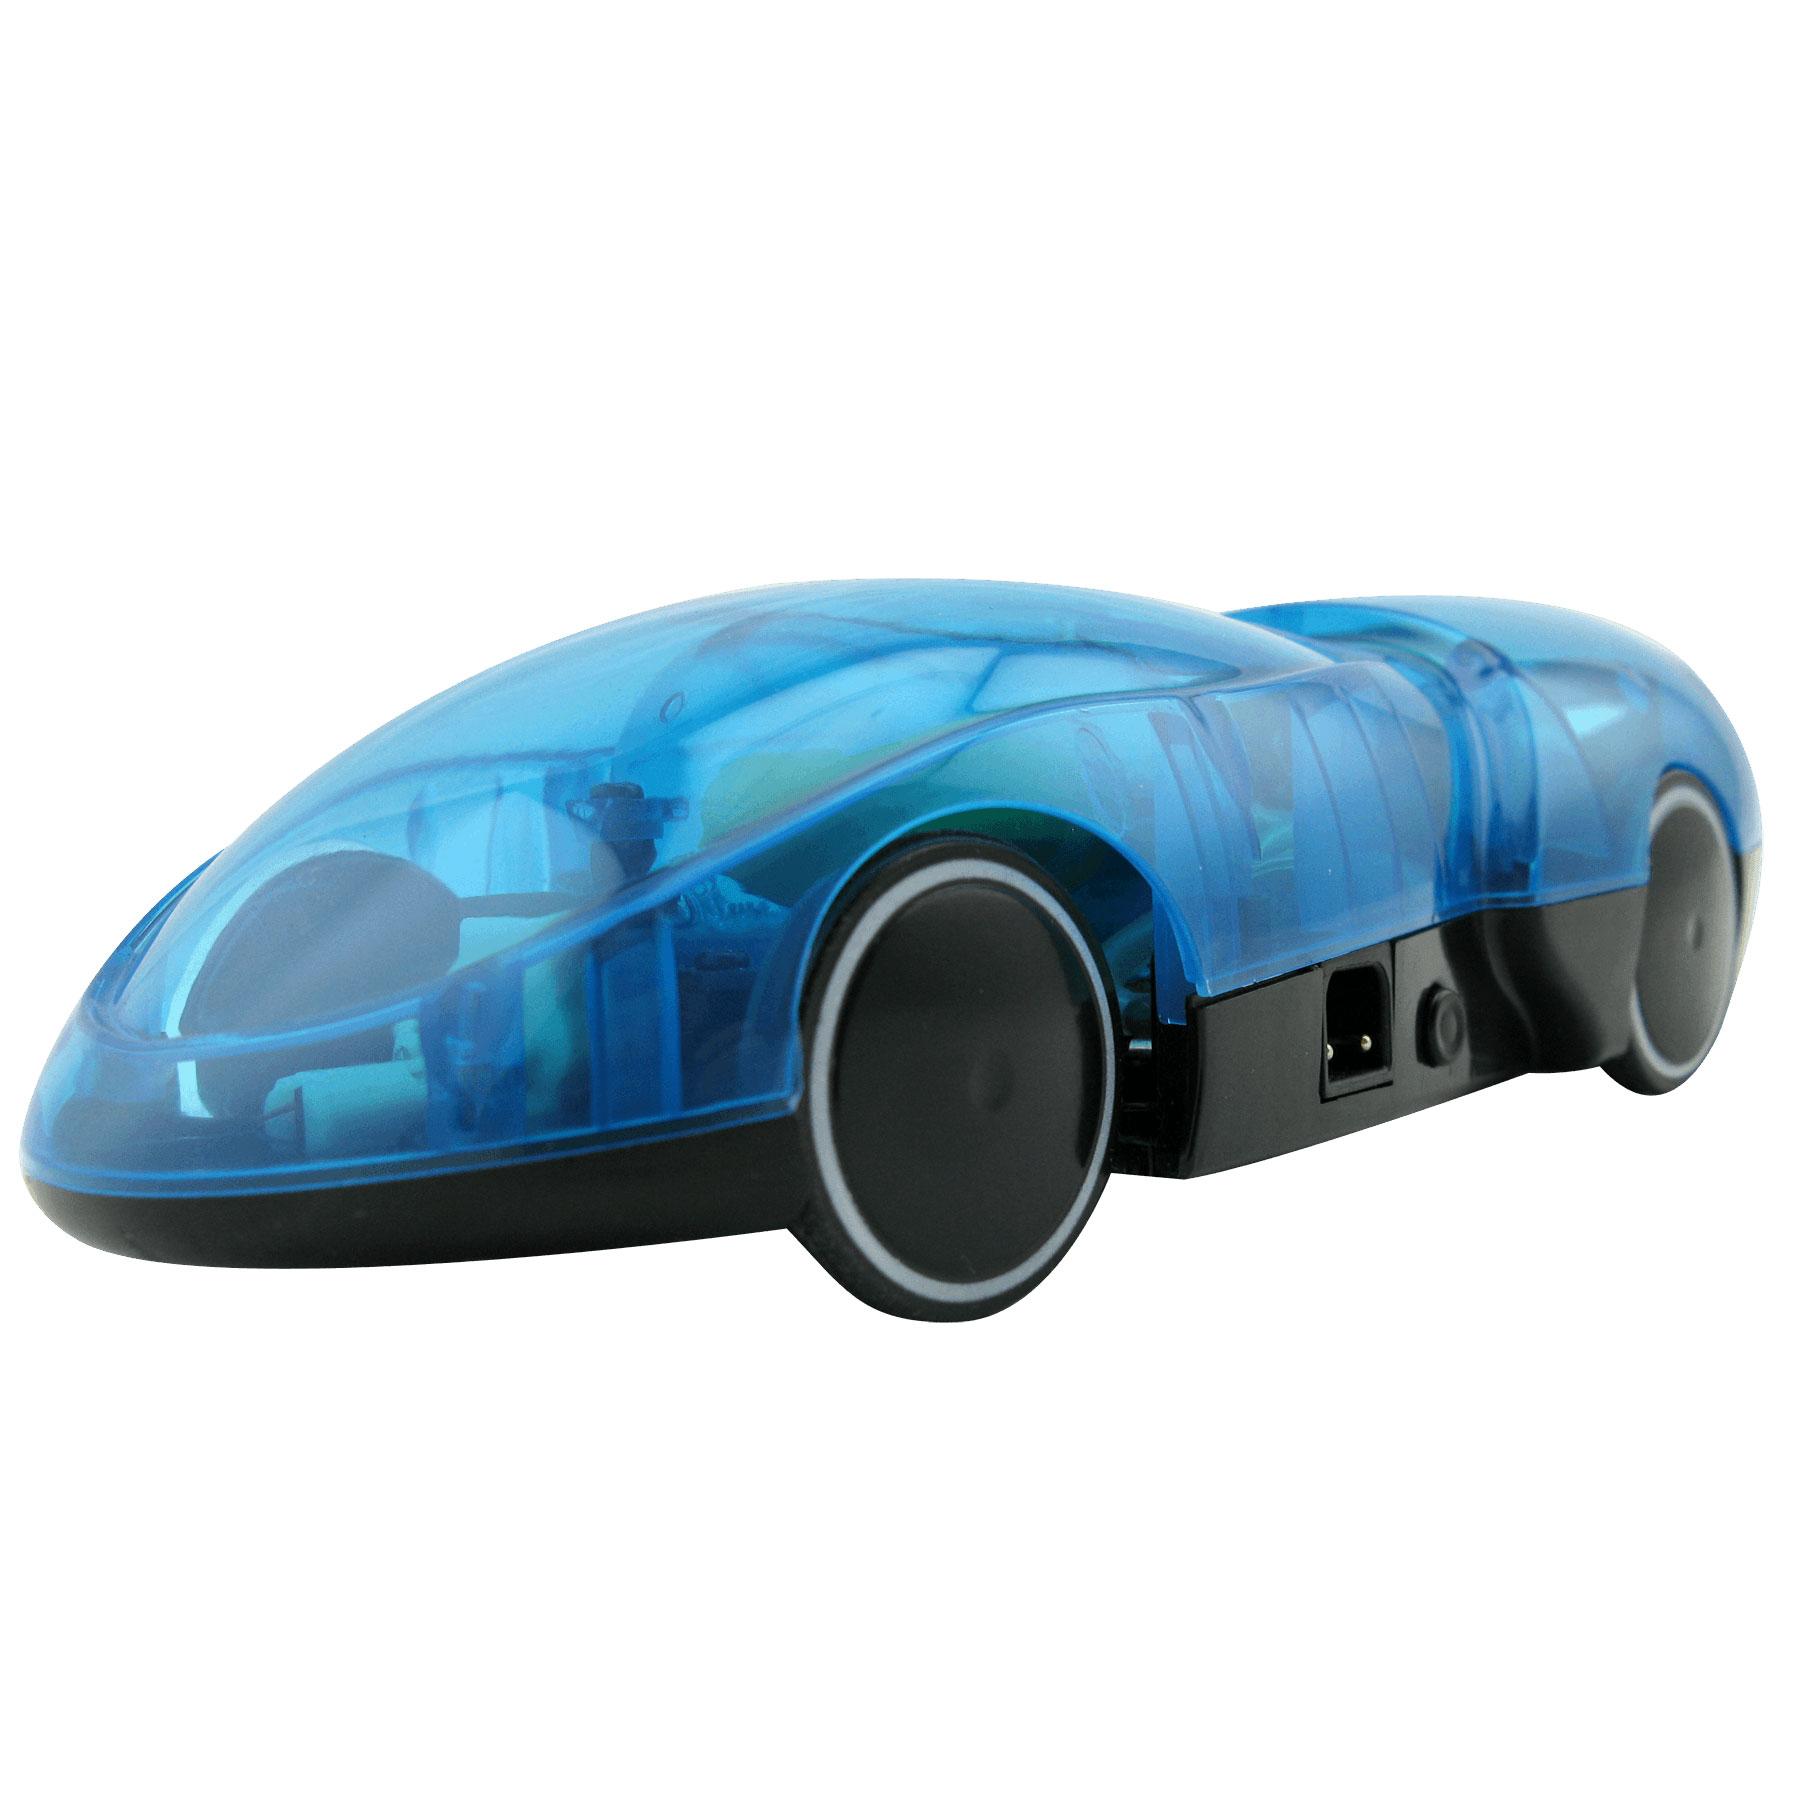 horizon fuel cell technologies i h2go accessoires divers smartphone horizon fuel cell. Black Bedroom Furniture Sets. Home Design Ideas